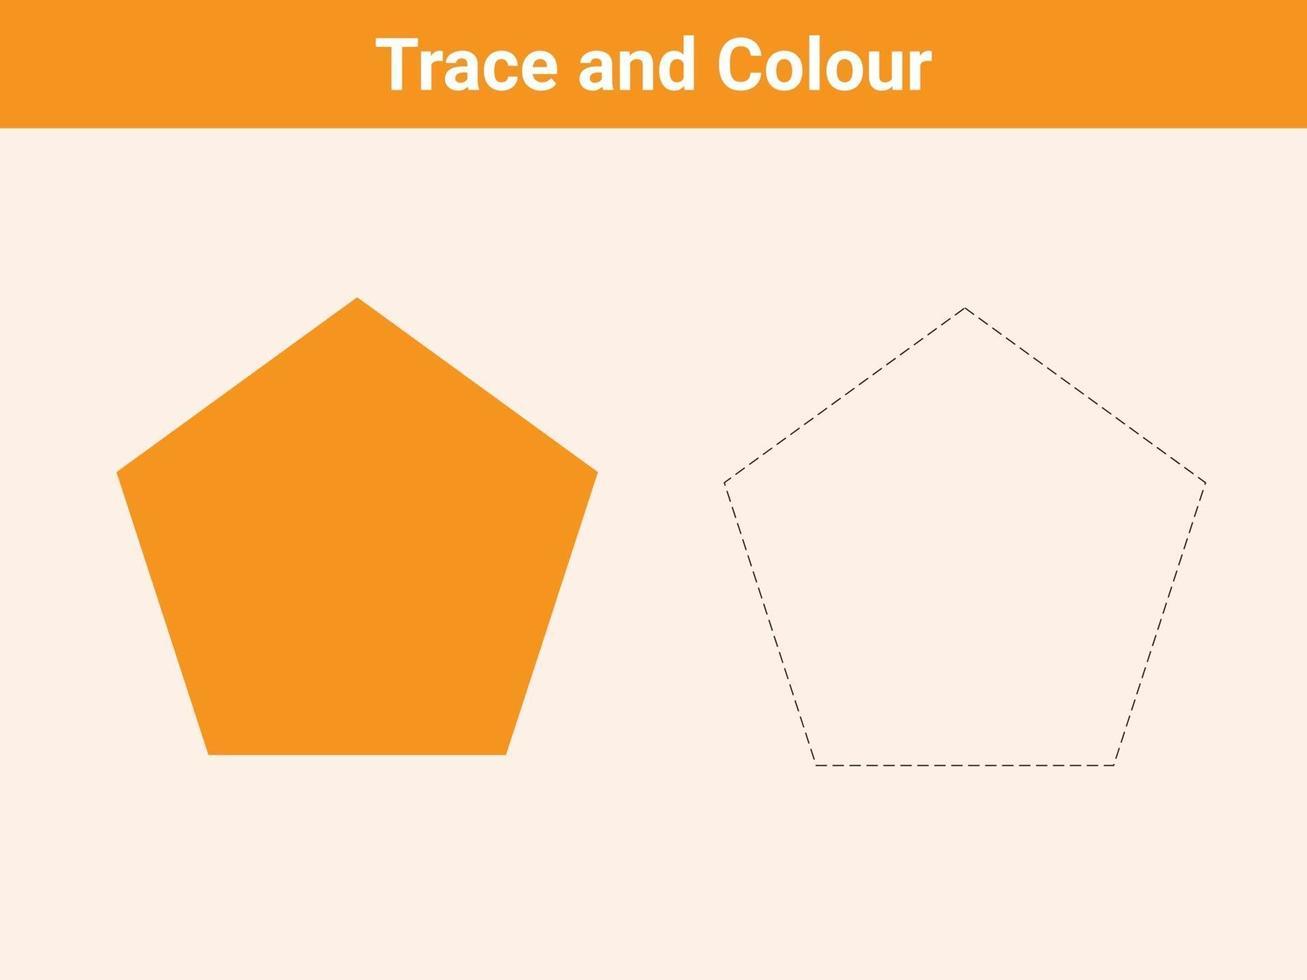 trace en kleur pentagon gratis vector